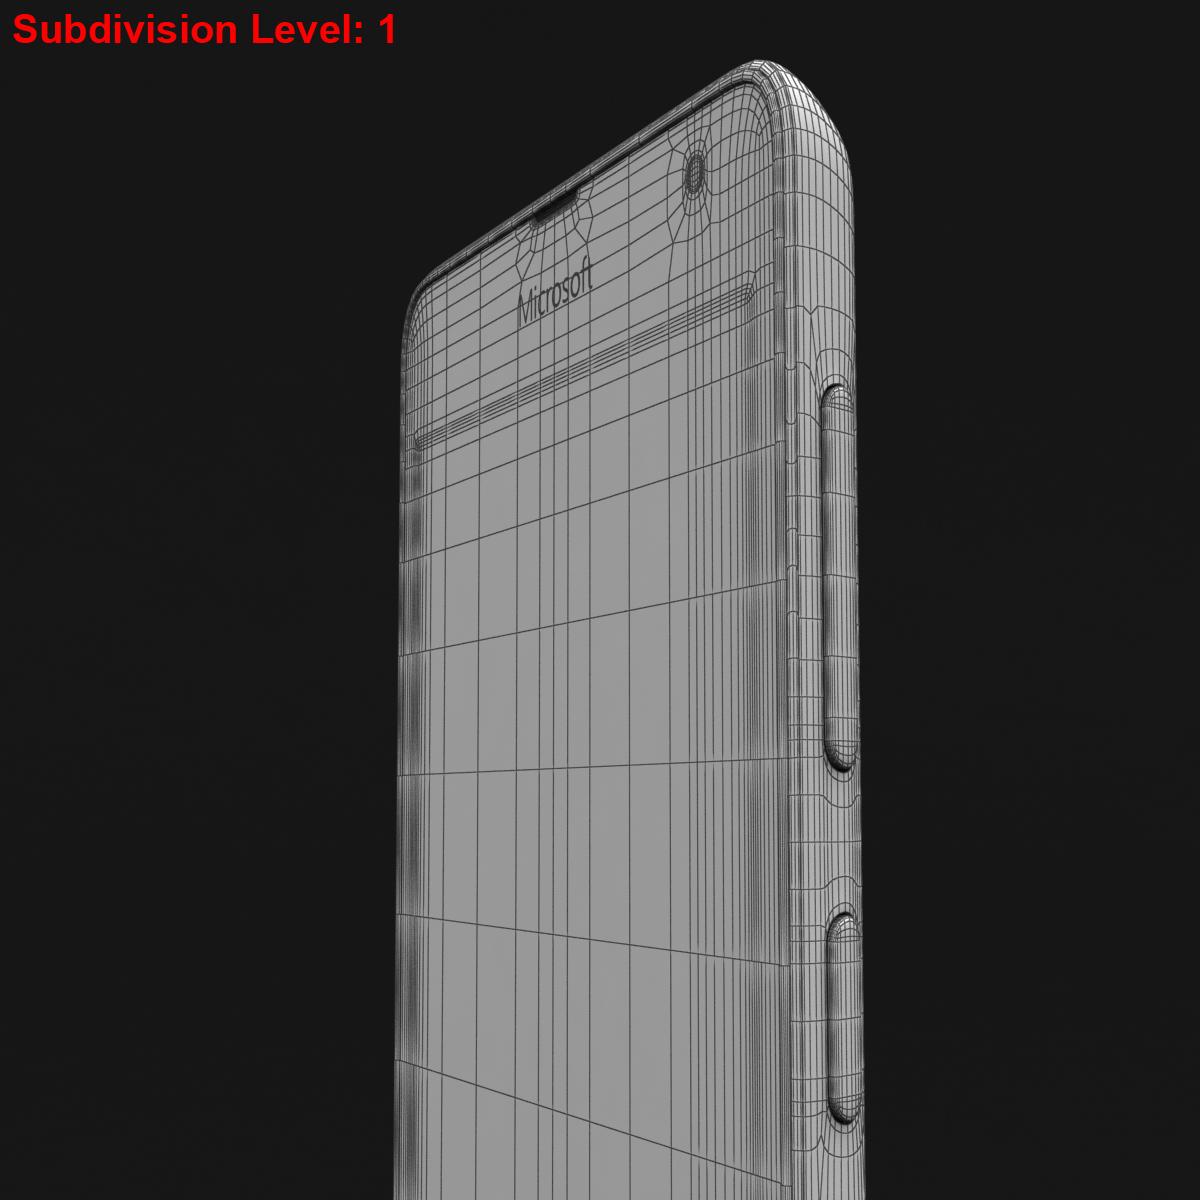 microsoft lumia 535 and dual sim green 3d model 3ds max fbx c4d obj 204194